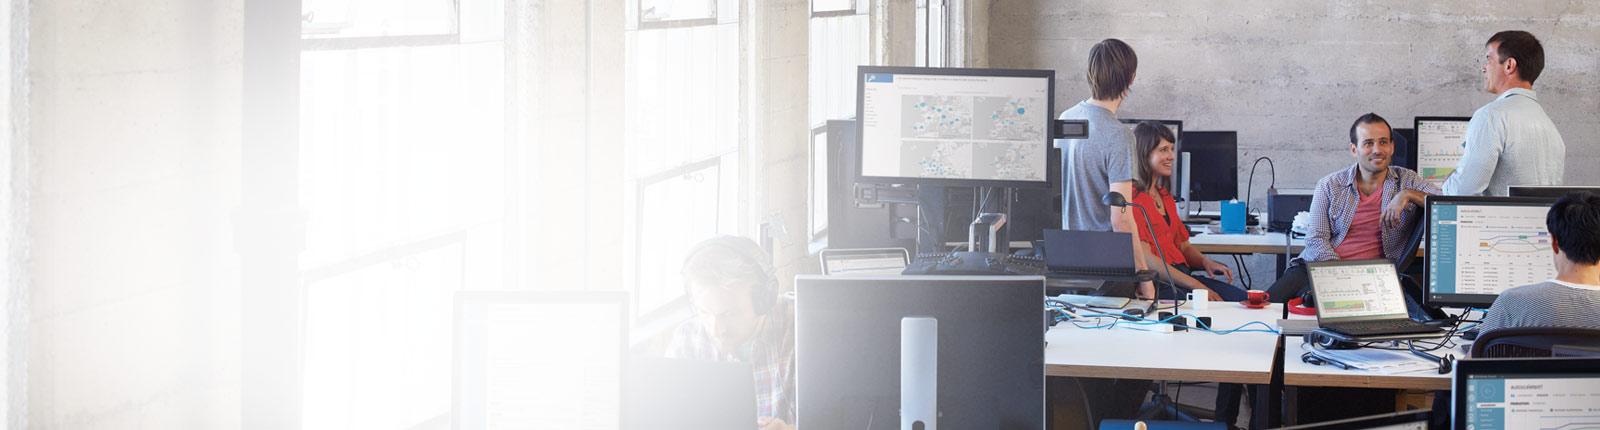 Lima individu bekerja menggunakan Office 365 pada desktop mereka di pejabat.